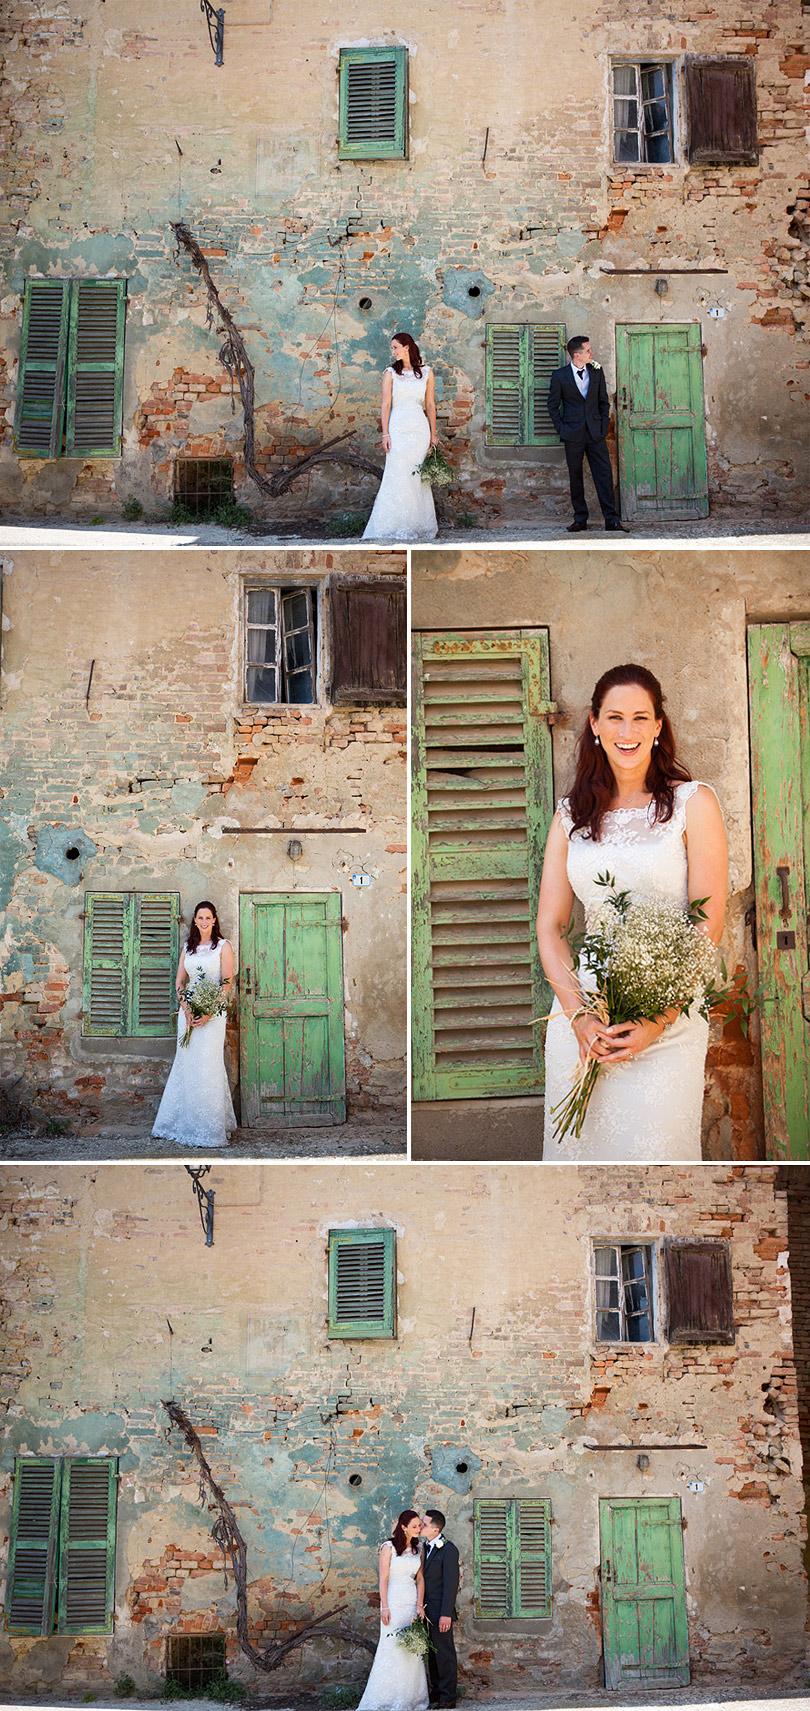 Castello-di-Cortanze-Italian-Wedding-LilyandFrankPhotography_22.jpg